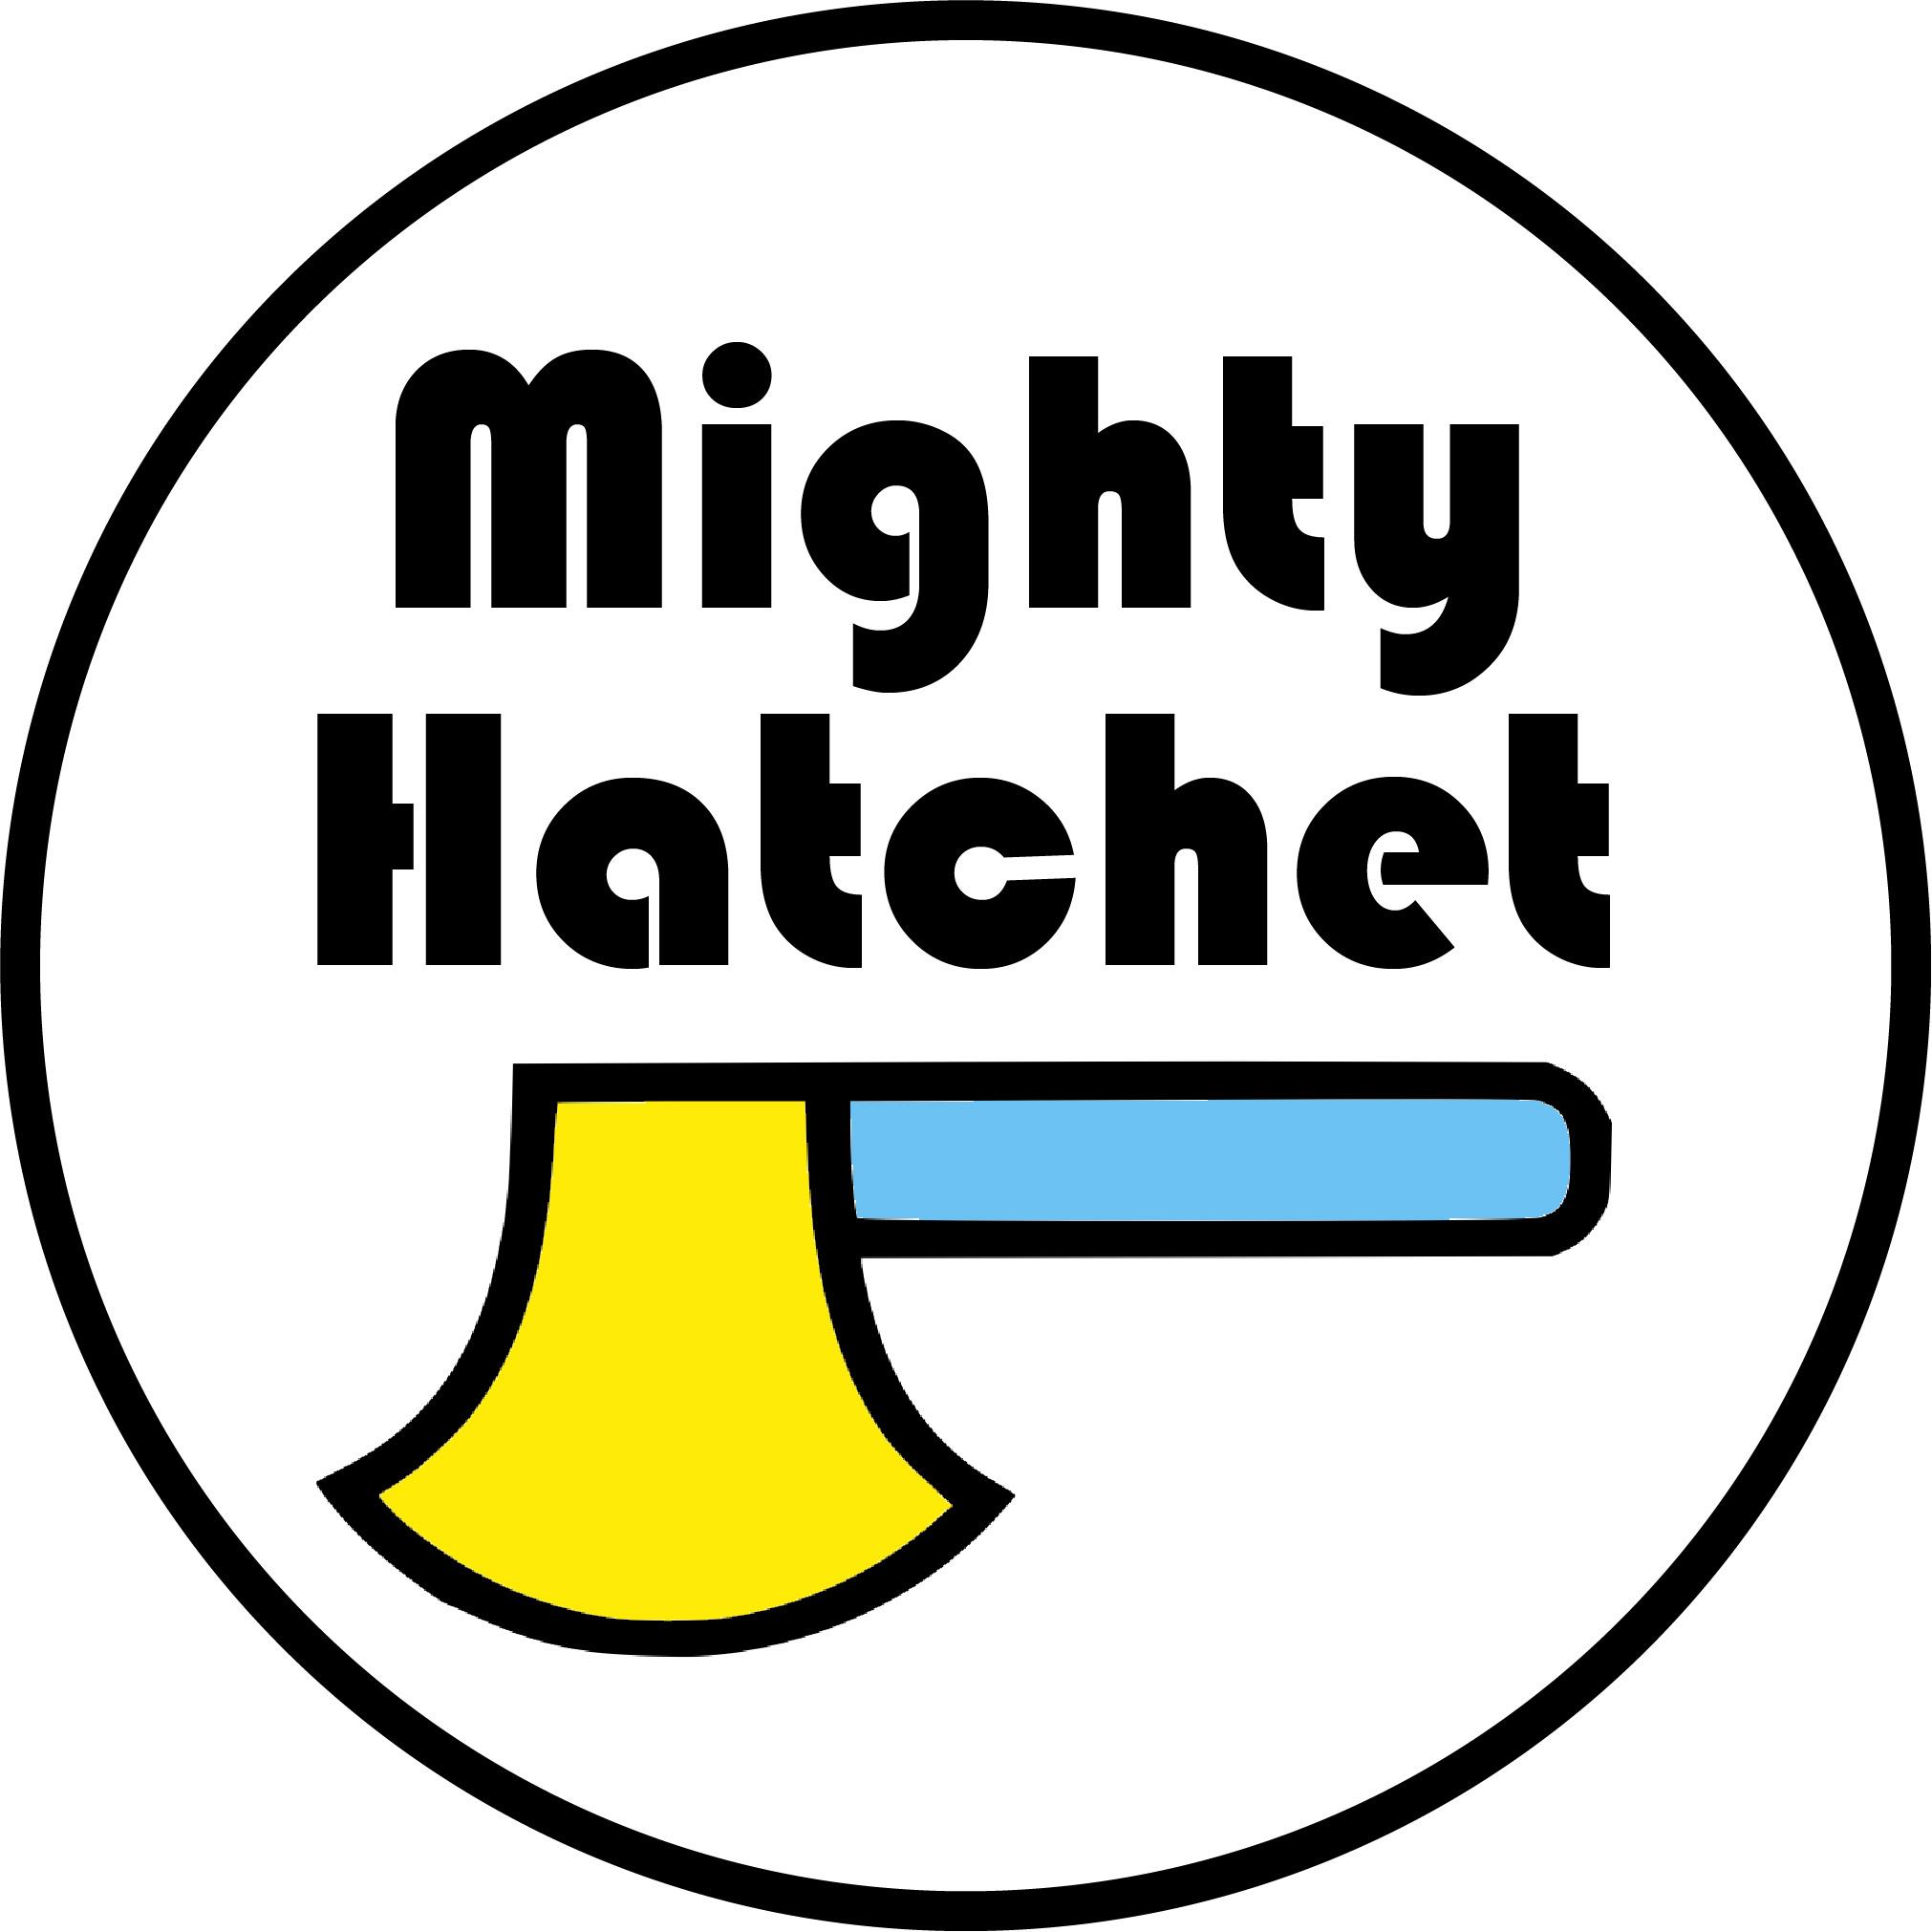 mighty hatchet Logo 01.jpg